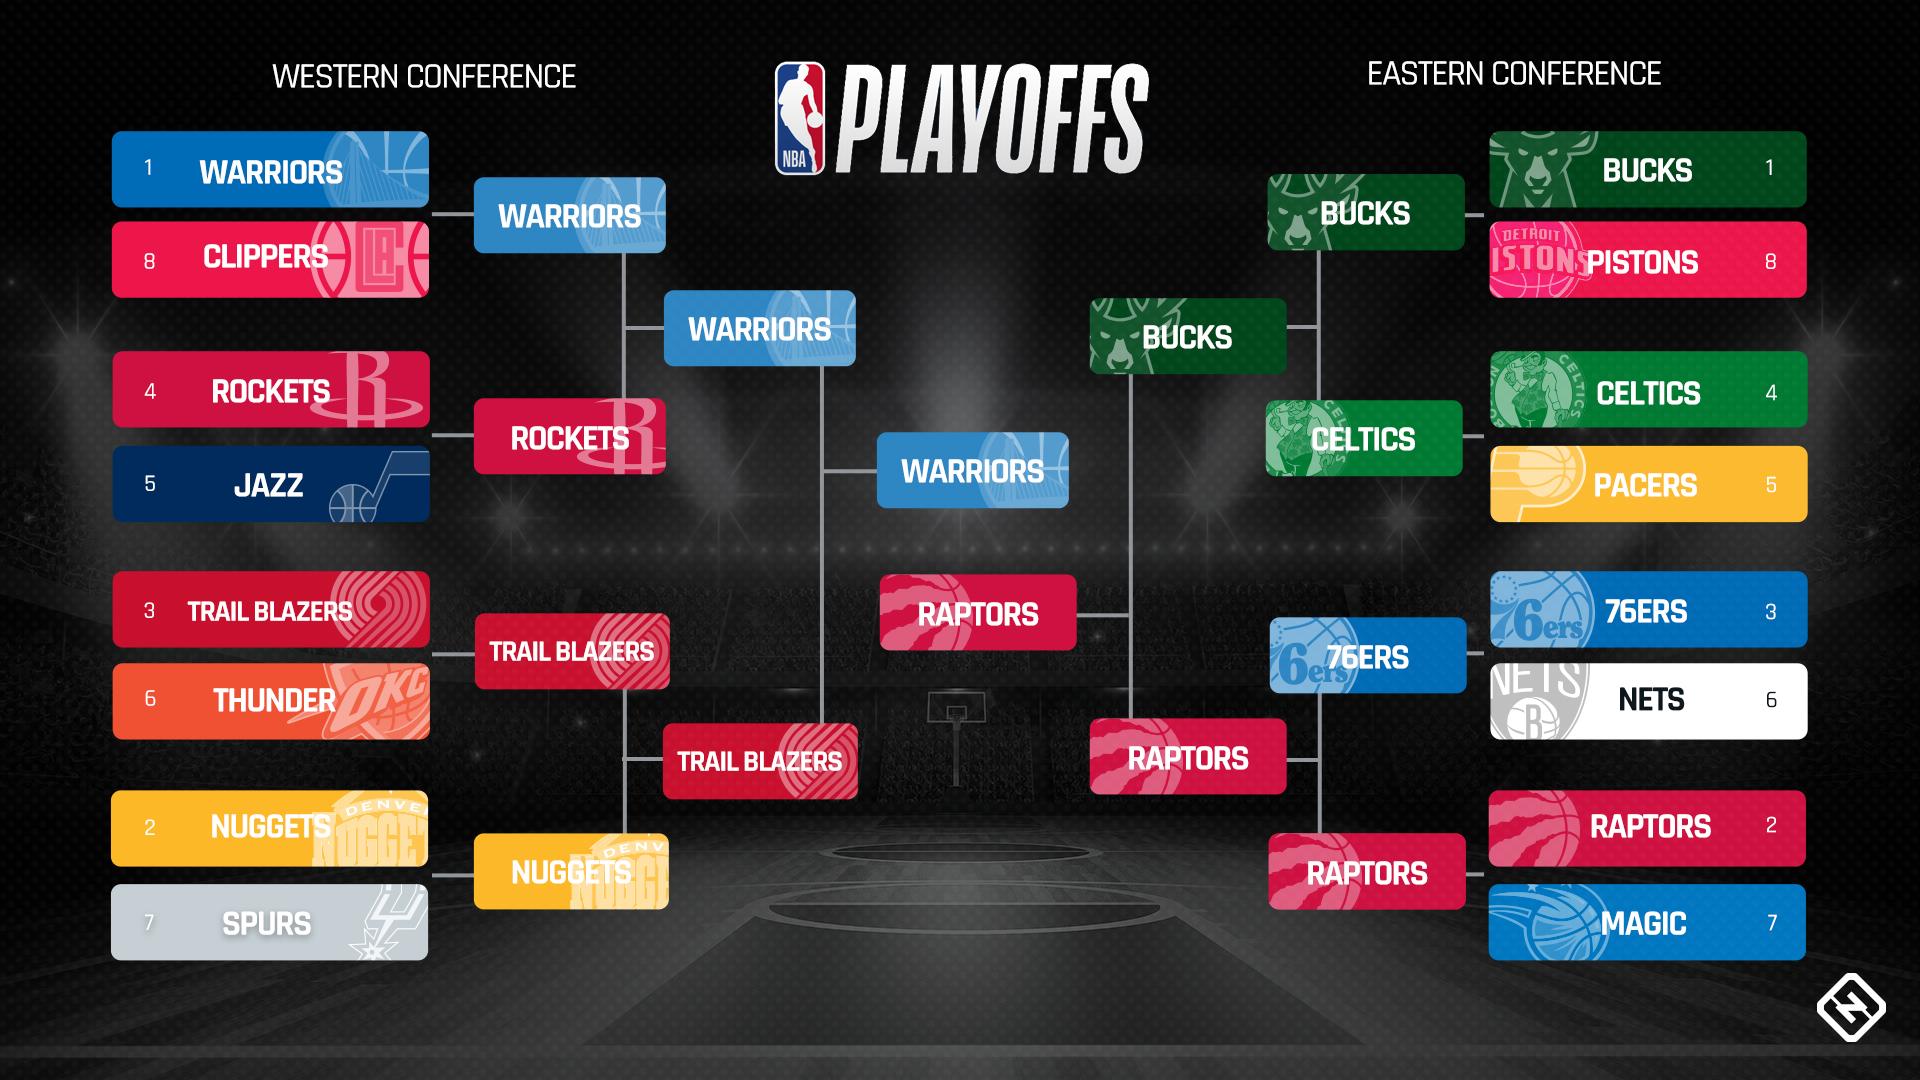 NBA Playoffs Bracket 2019: Full Schedule, Dates, Times, TV